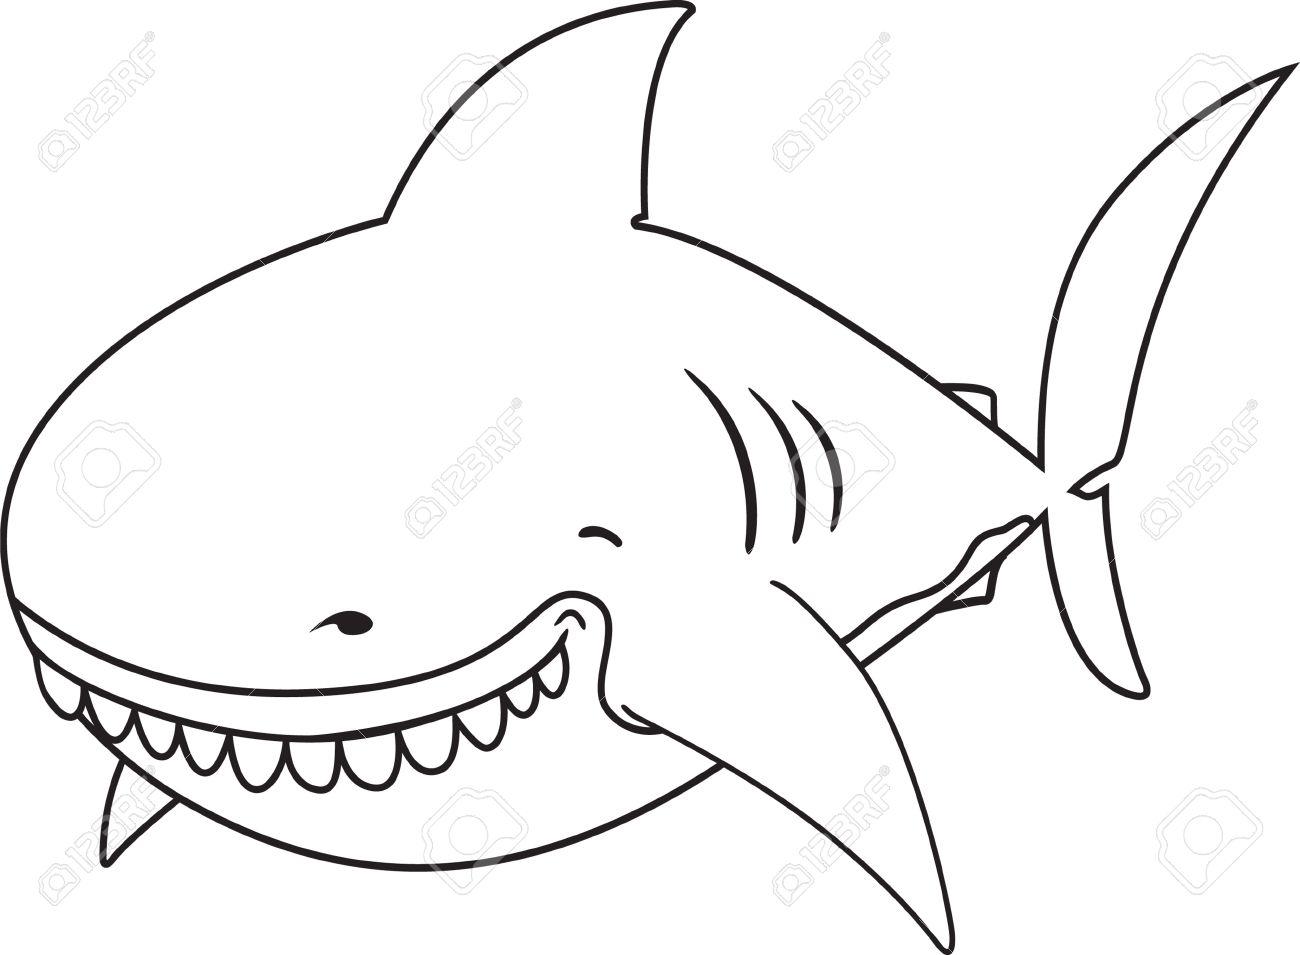 Lindo Aspecto Gracioso Gran Libro Para Colorear Tiburón Blanco